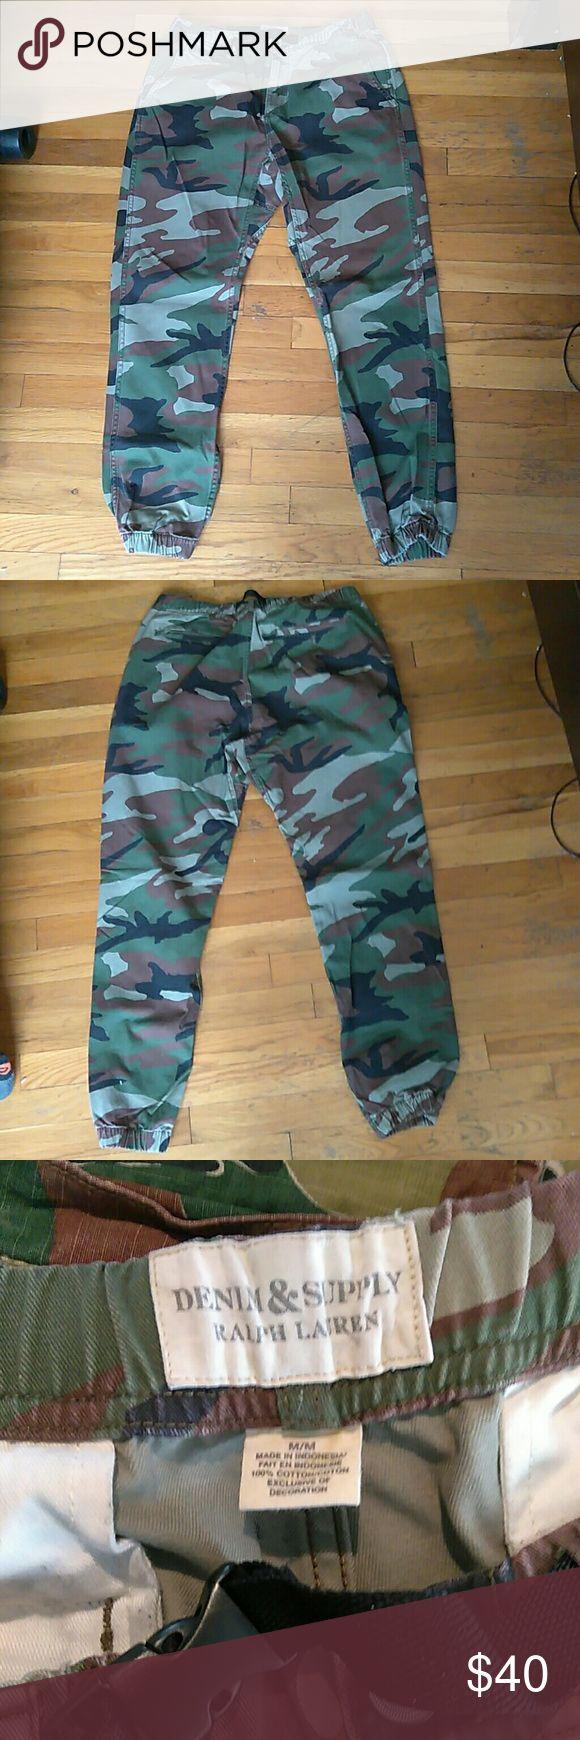 Denim Supply camo jogger pants size Medium Denim Supply camo jogger pants size Medium in good condition Denim & Supply Ralph Lauren Pants Sweatpants & Joggers